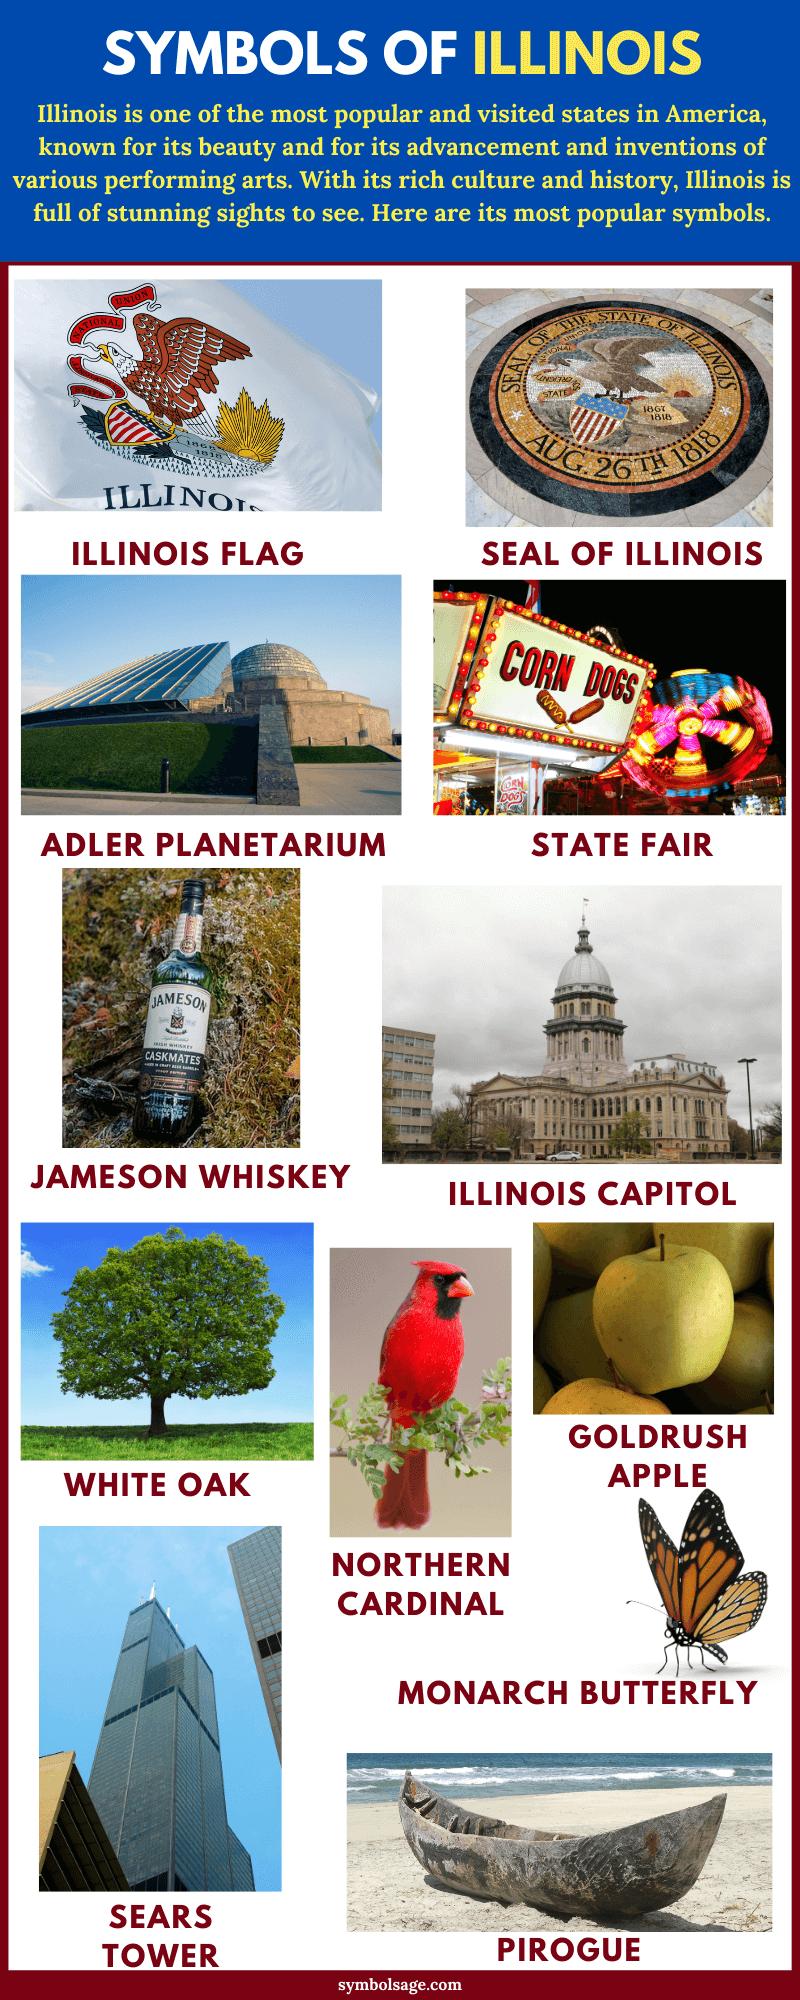 Symbols of Illinois